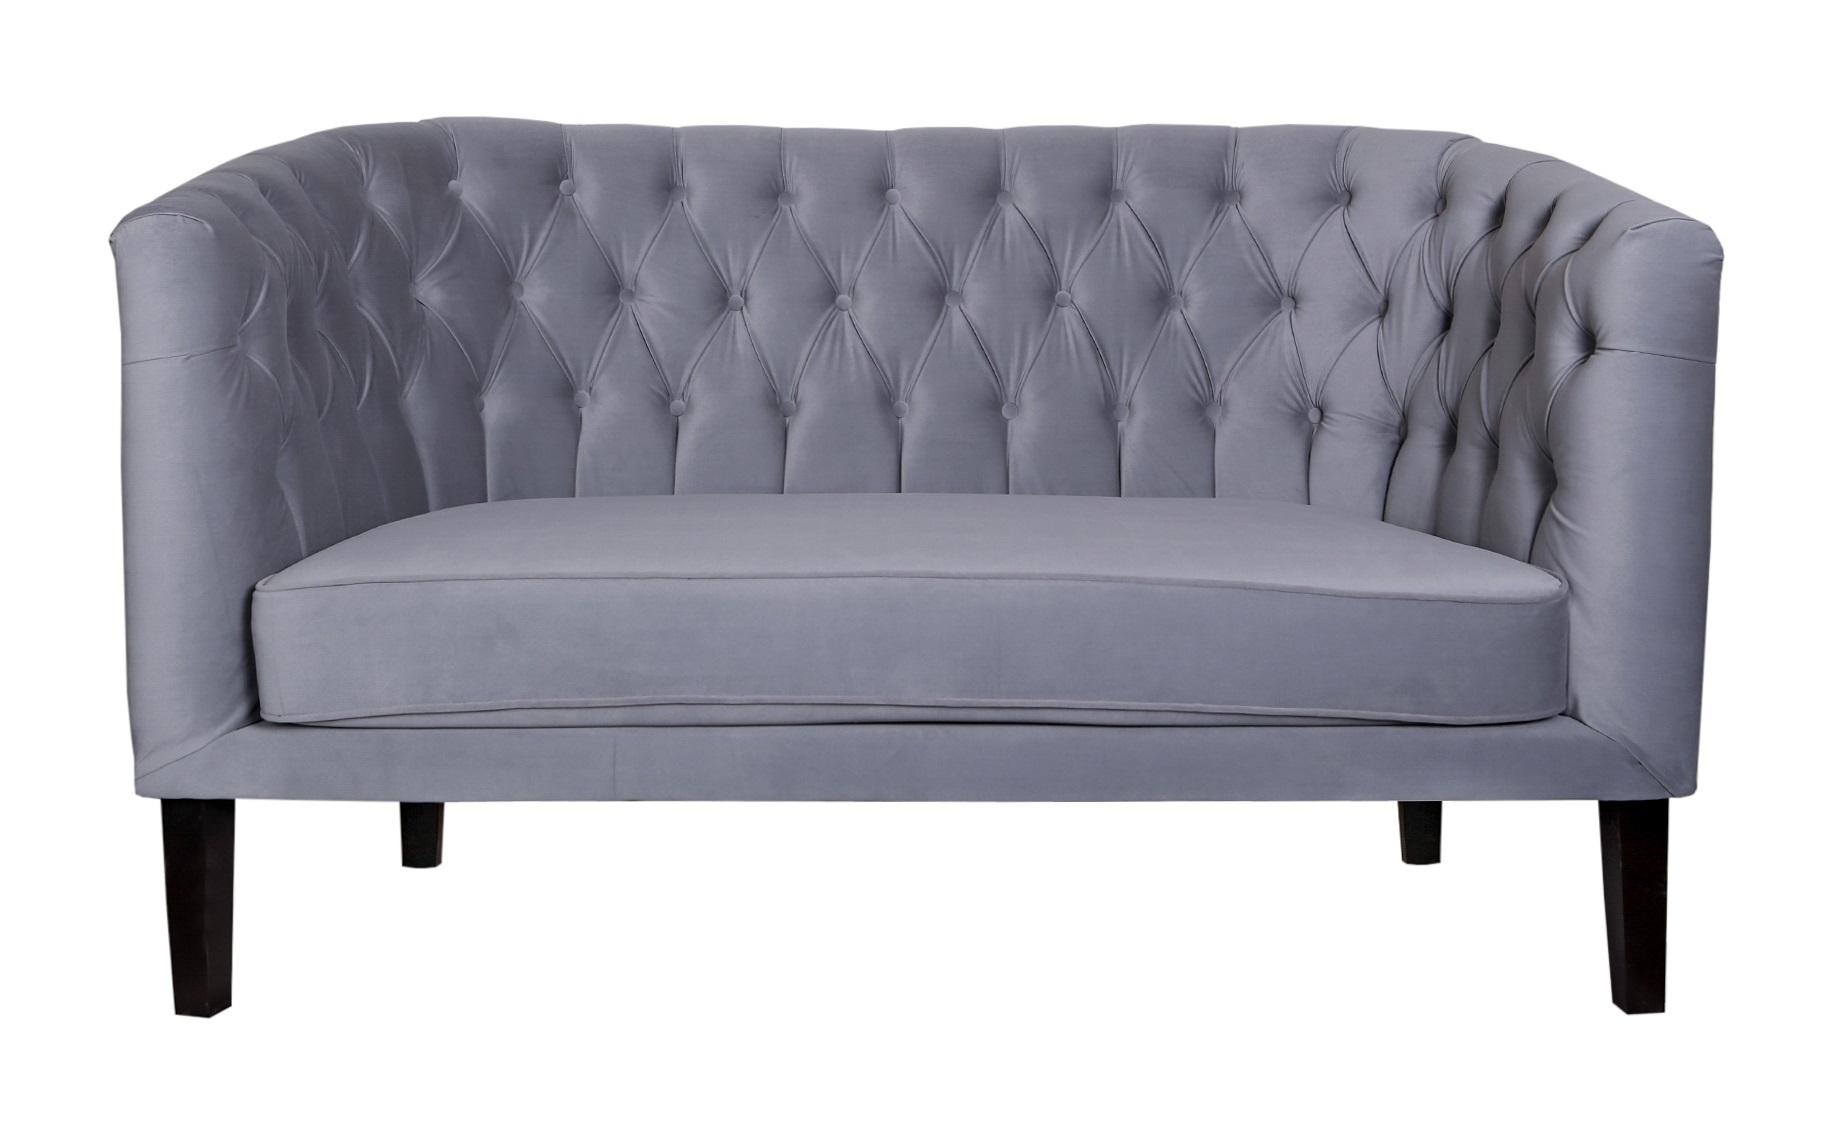 Mak-interior диван harry grey серый 116388/8